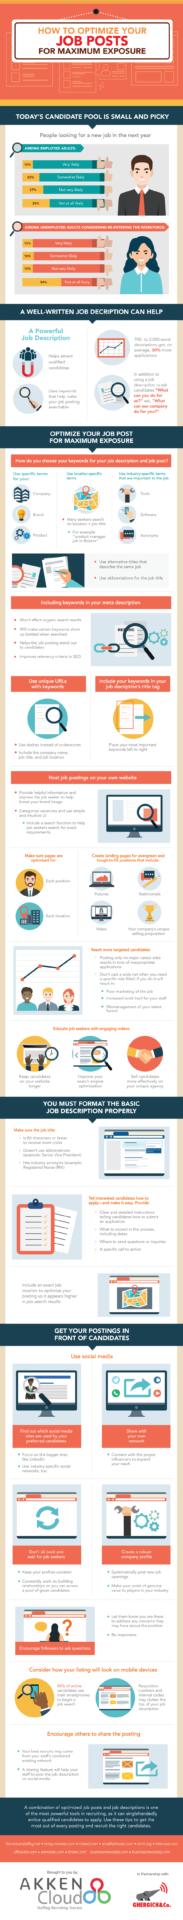 job post optimization infographic